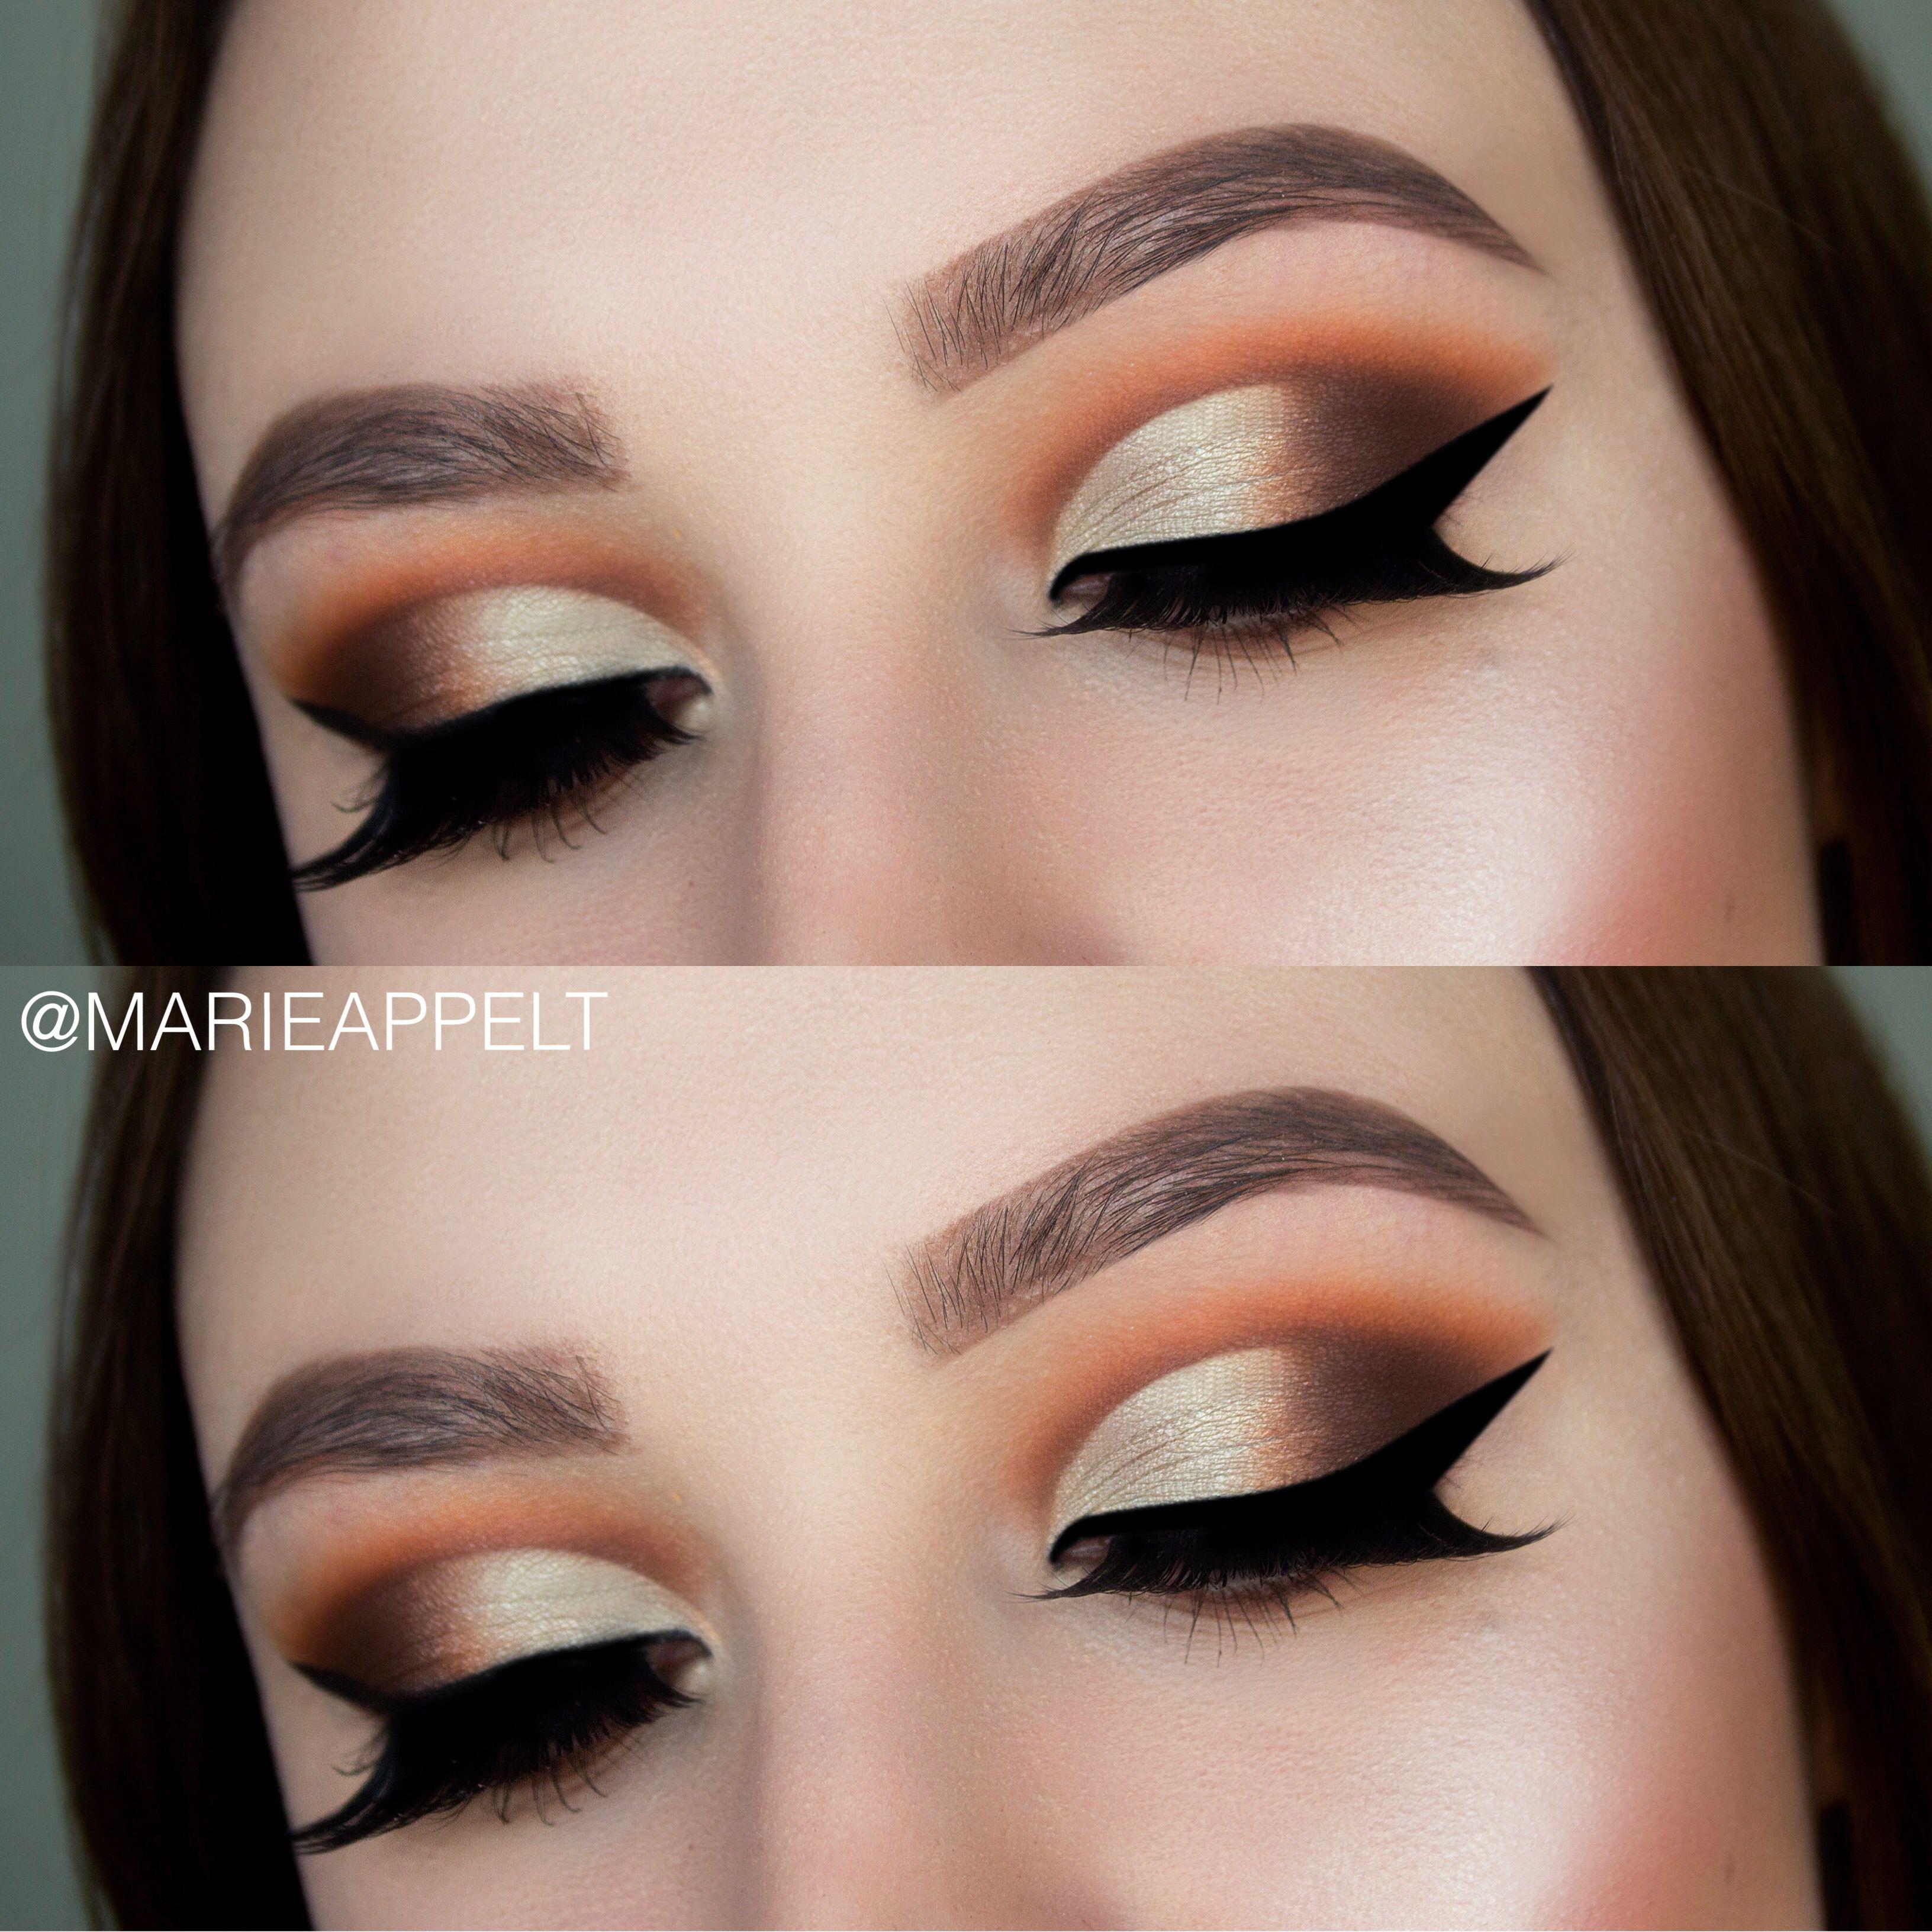 jaclyn hill x morphe brushes palette makeup tutorial, makeup, look